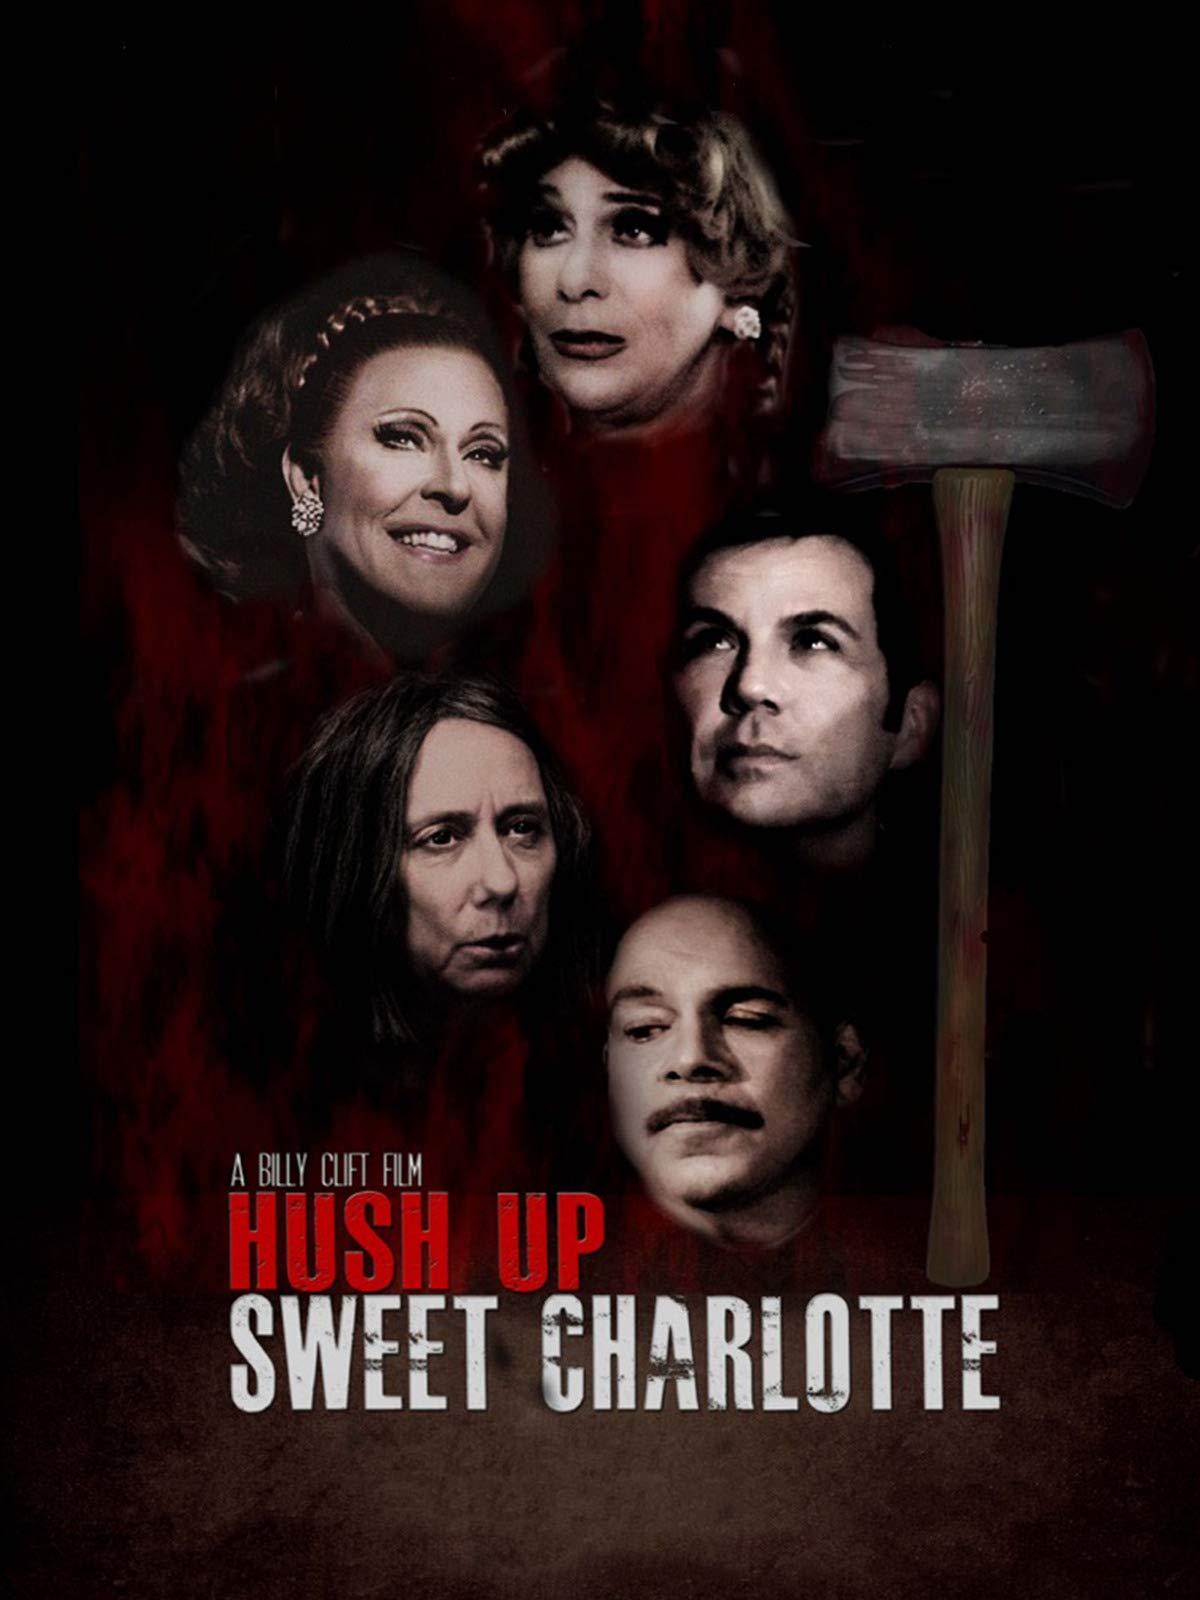 Hush Up, Sweet Charlotte